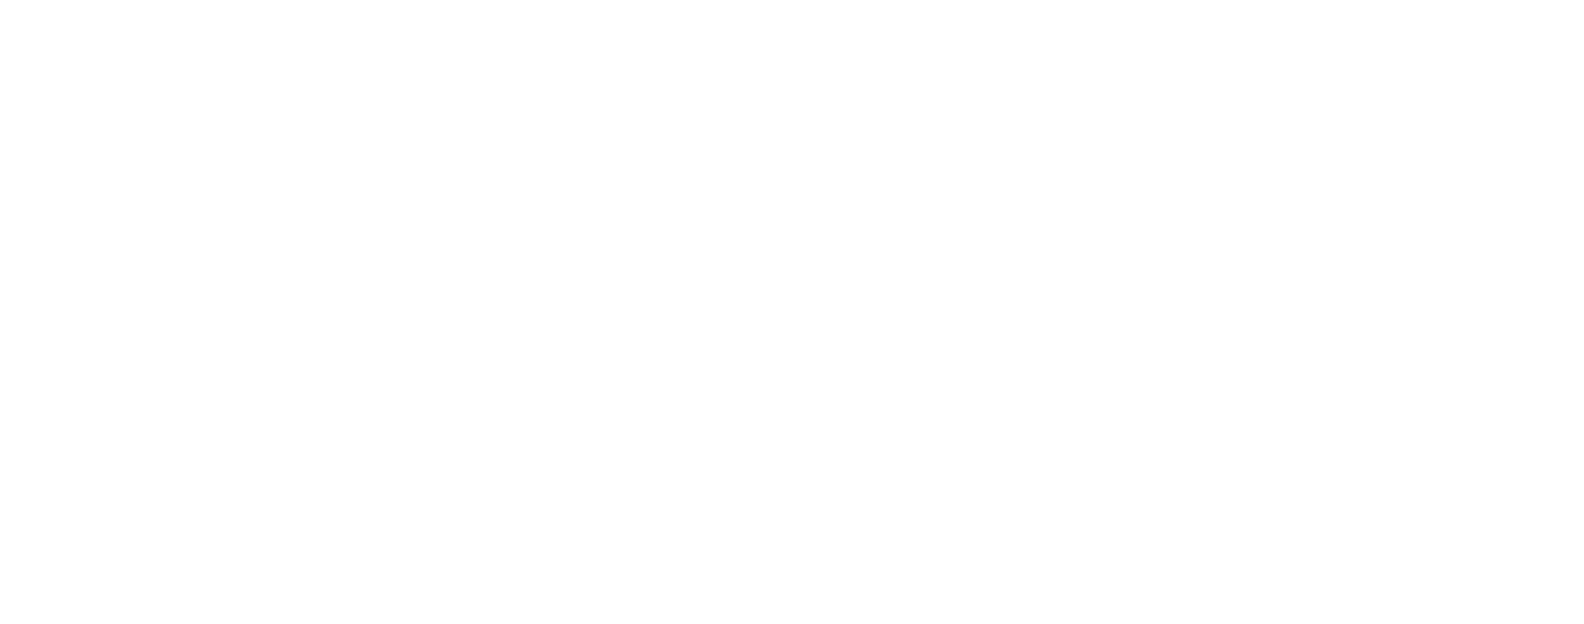 Sturgeon's Optical